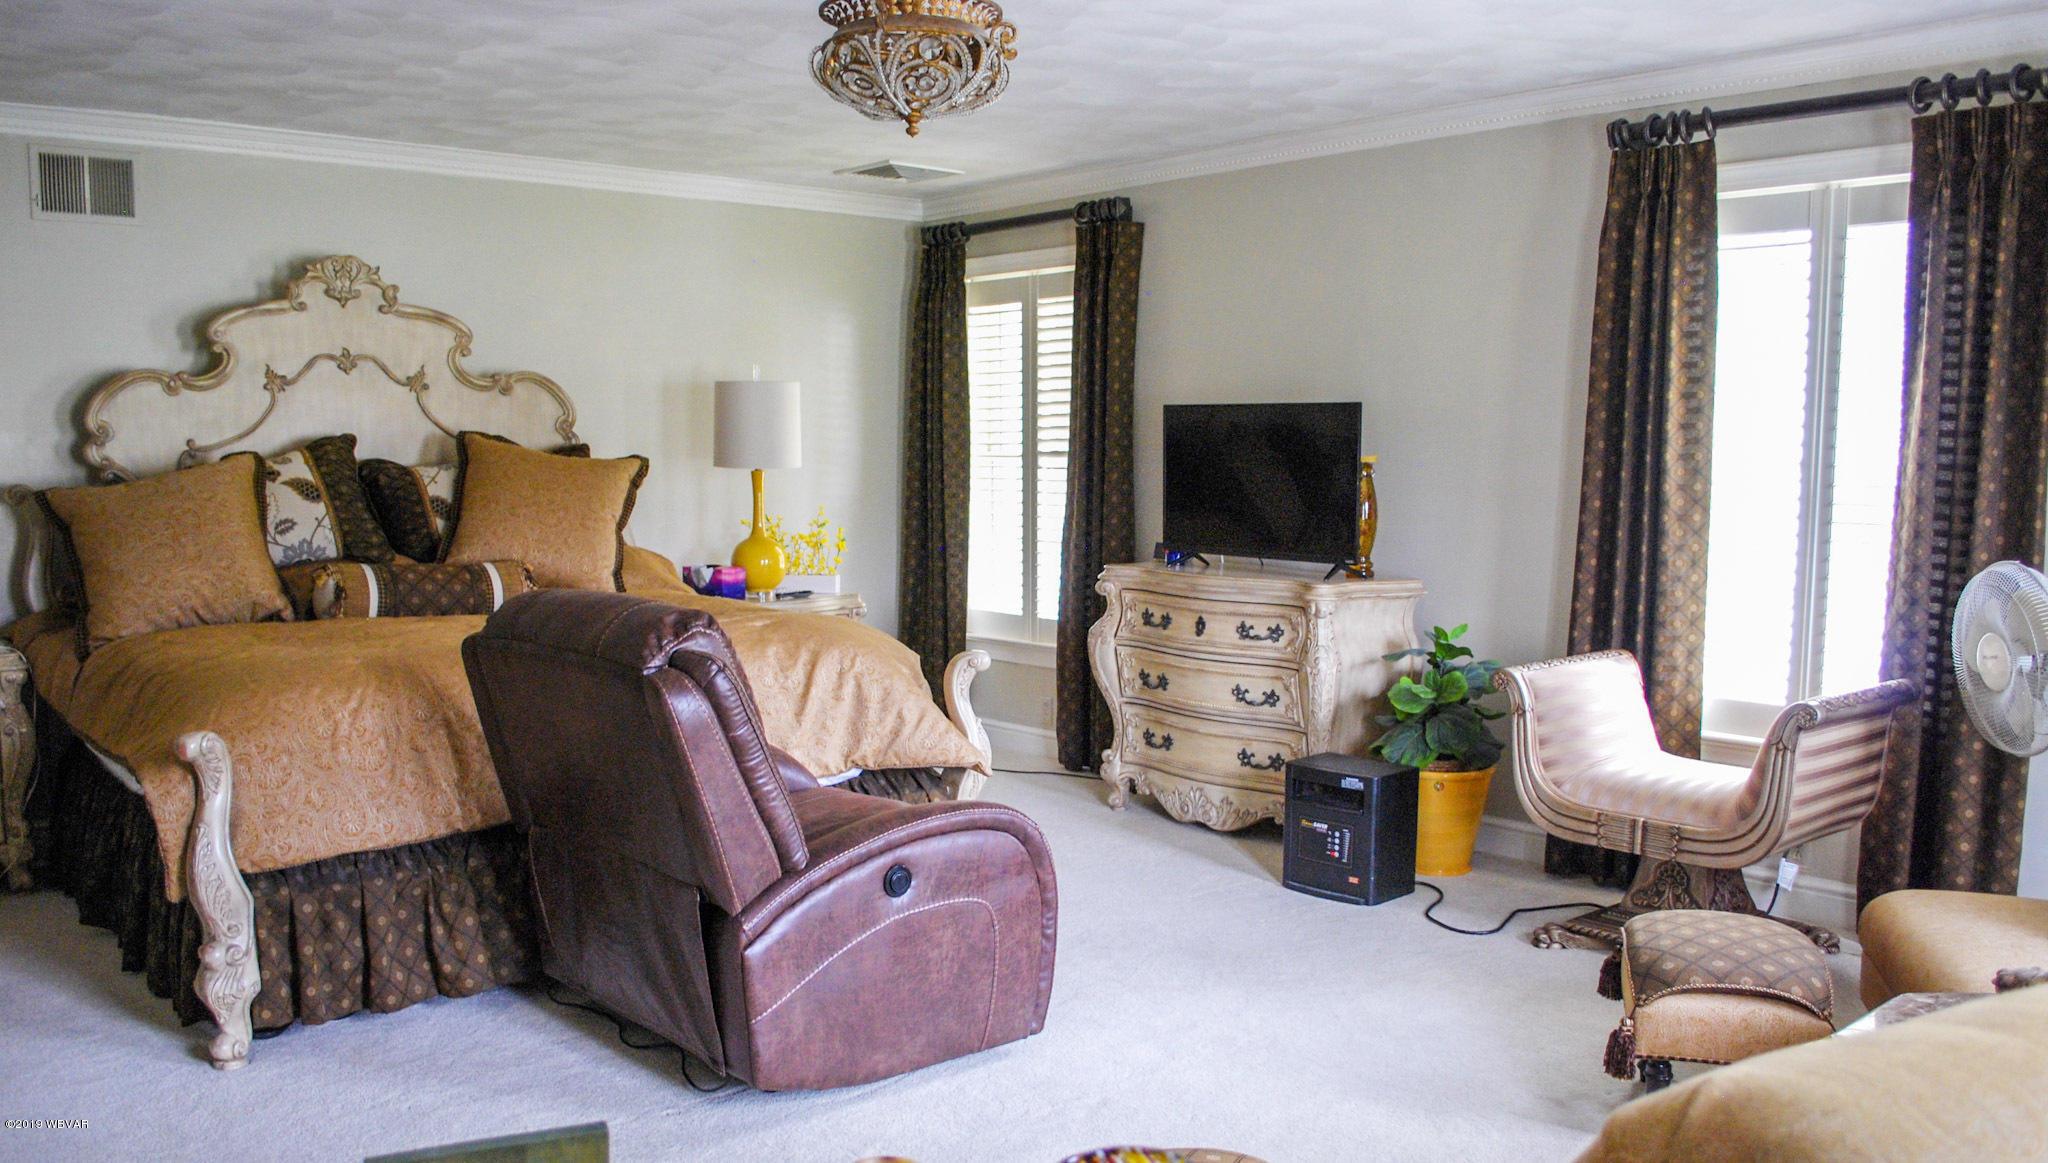 290 DOCHTER STREET,Jersey Shore,PA 17740,6 Bedrooms Bedrooms,4 BathroomsBathrooms,Residential,DOCHTER,WB-87006